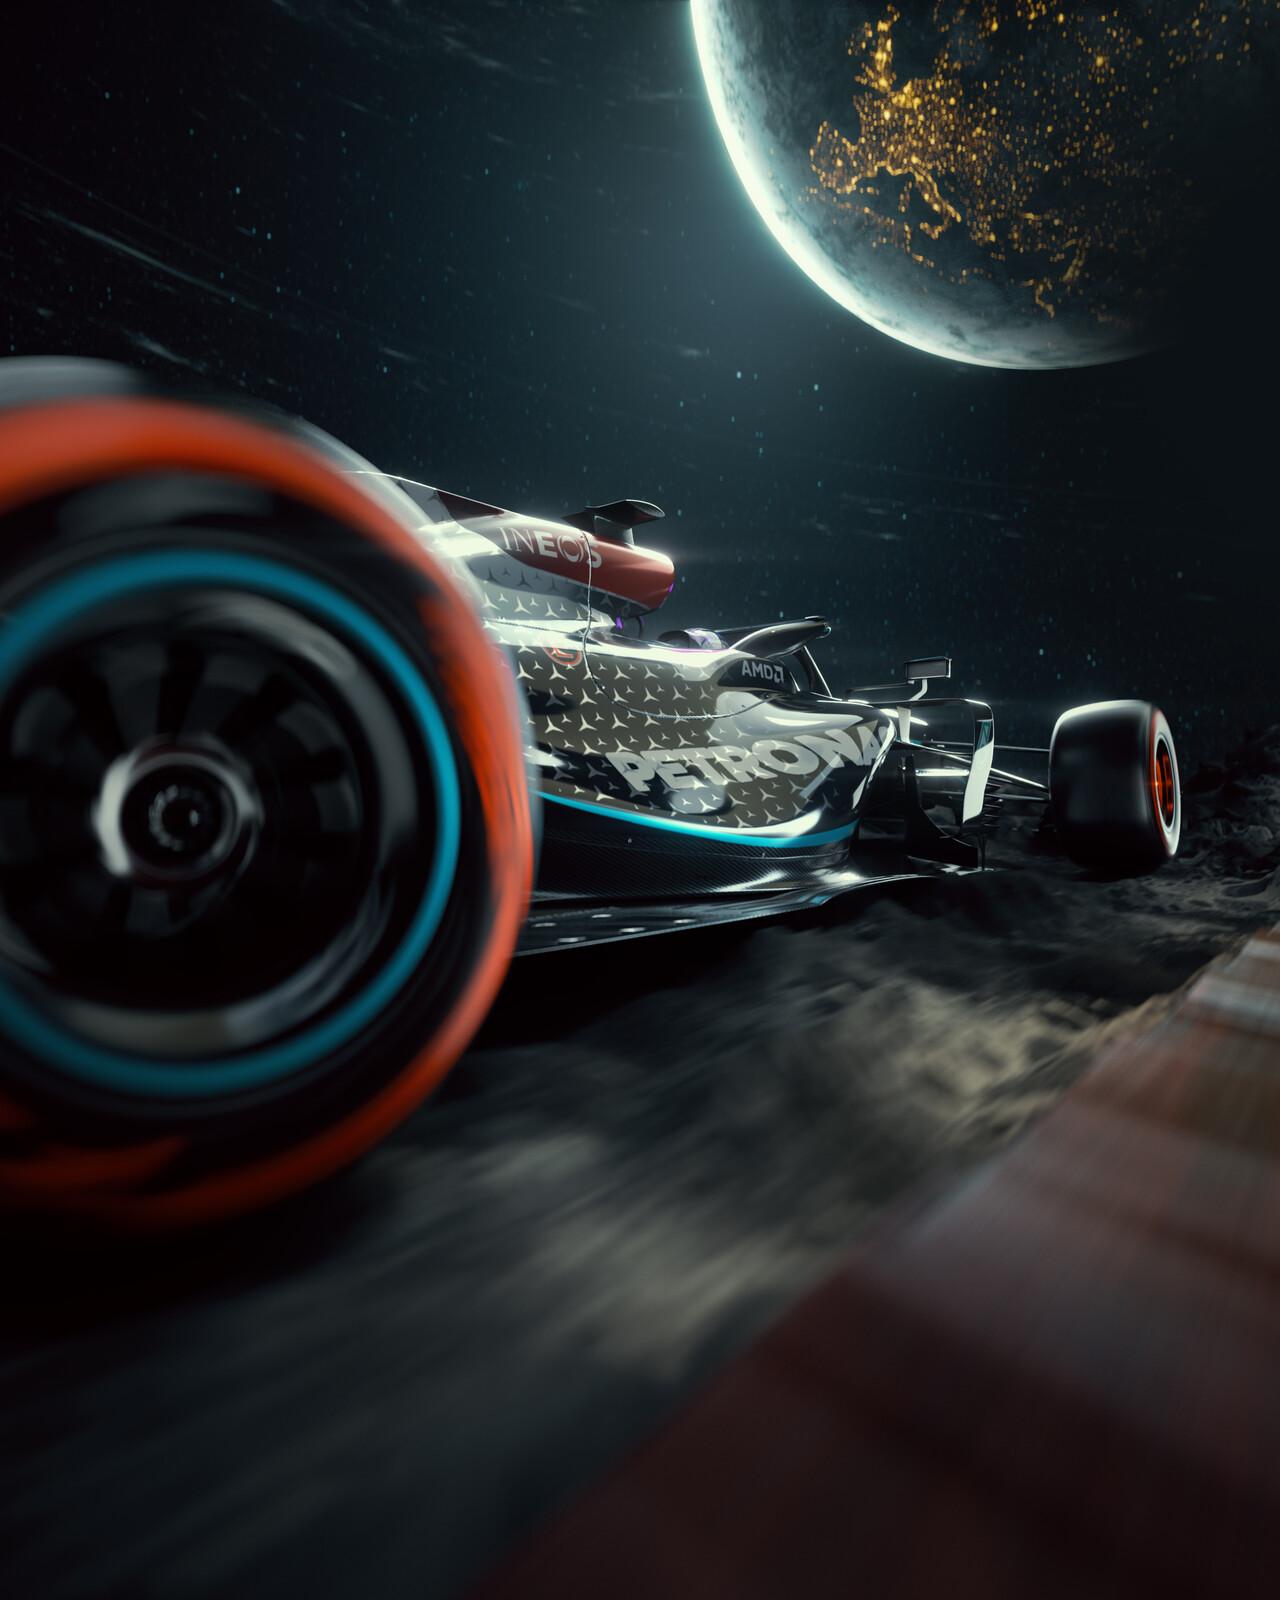 MERCEDES W12 FANART // F1 2021